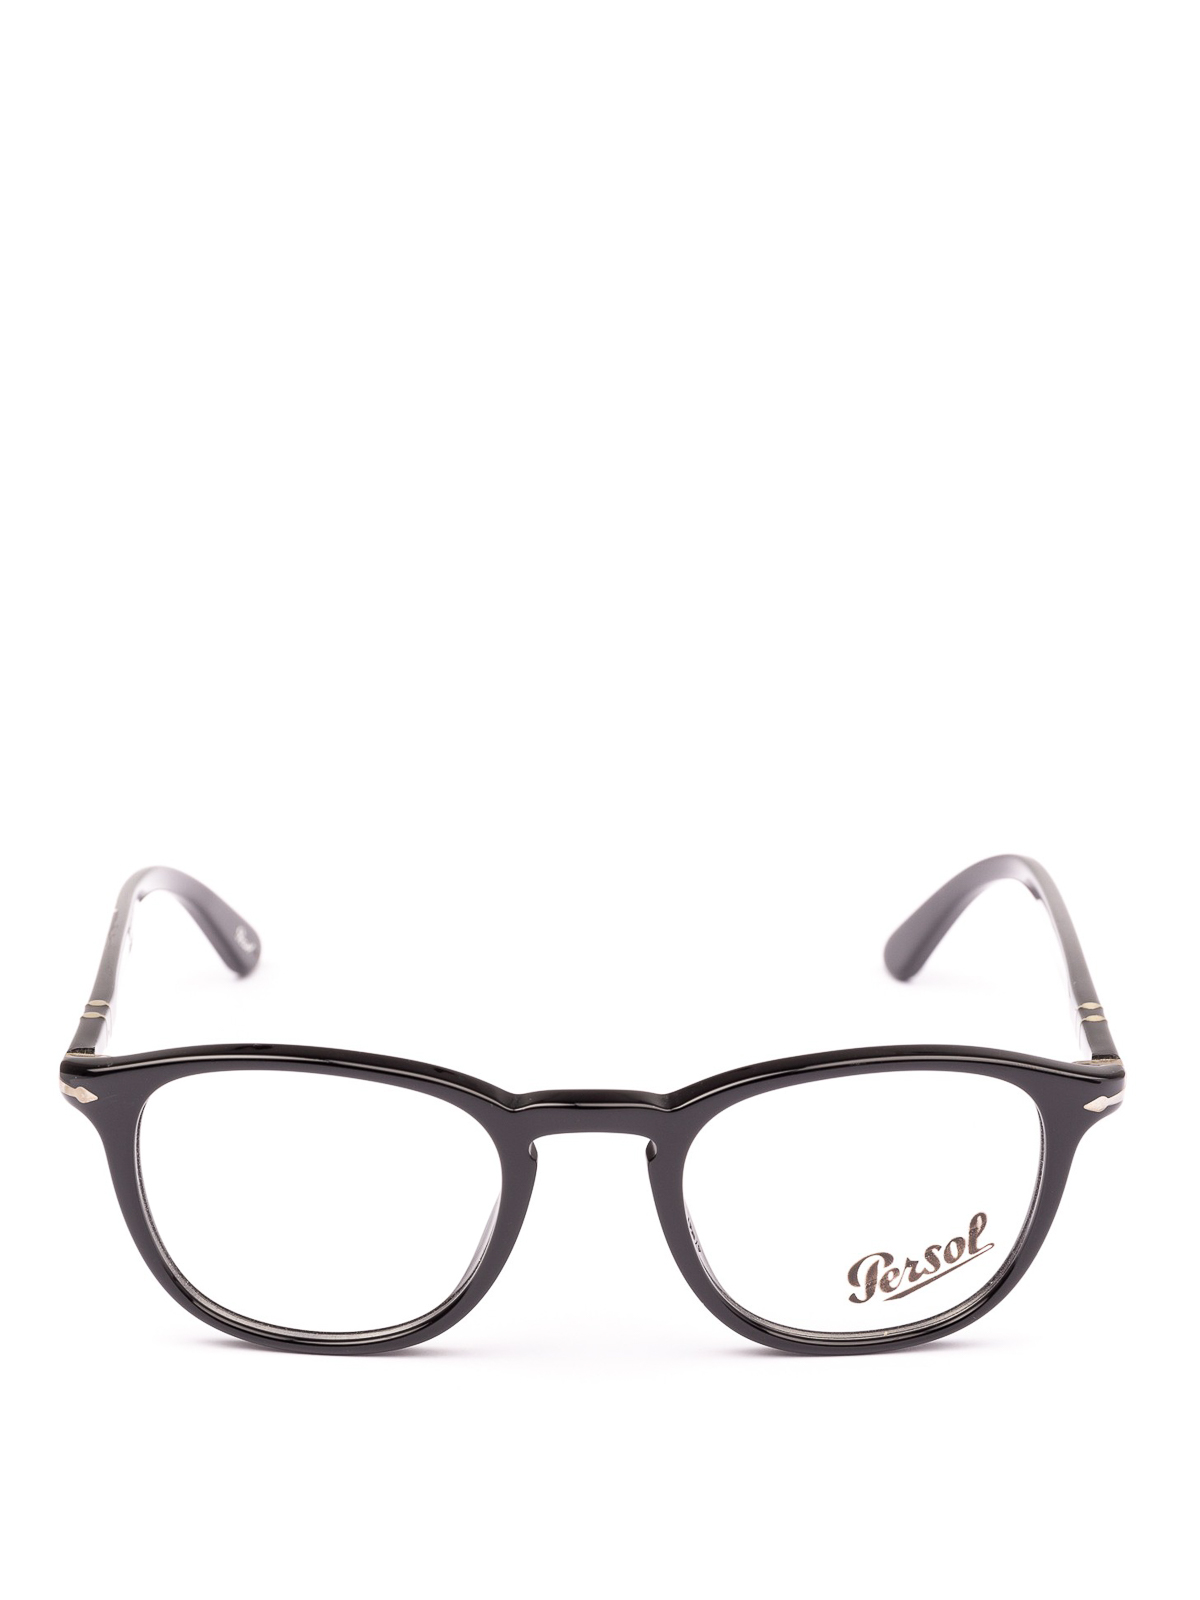 f3faeaa5b8 Persol - Galleria 900 black eyeglasses - glasses - PO 3143V 95 ...